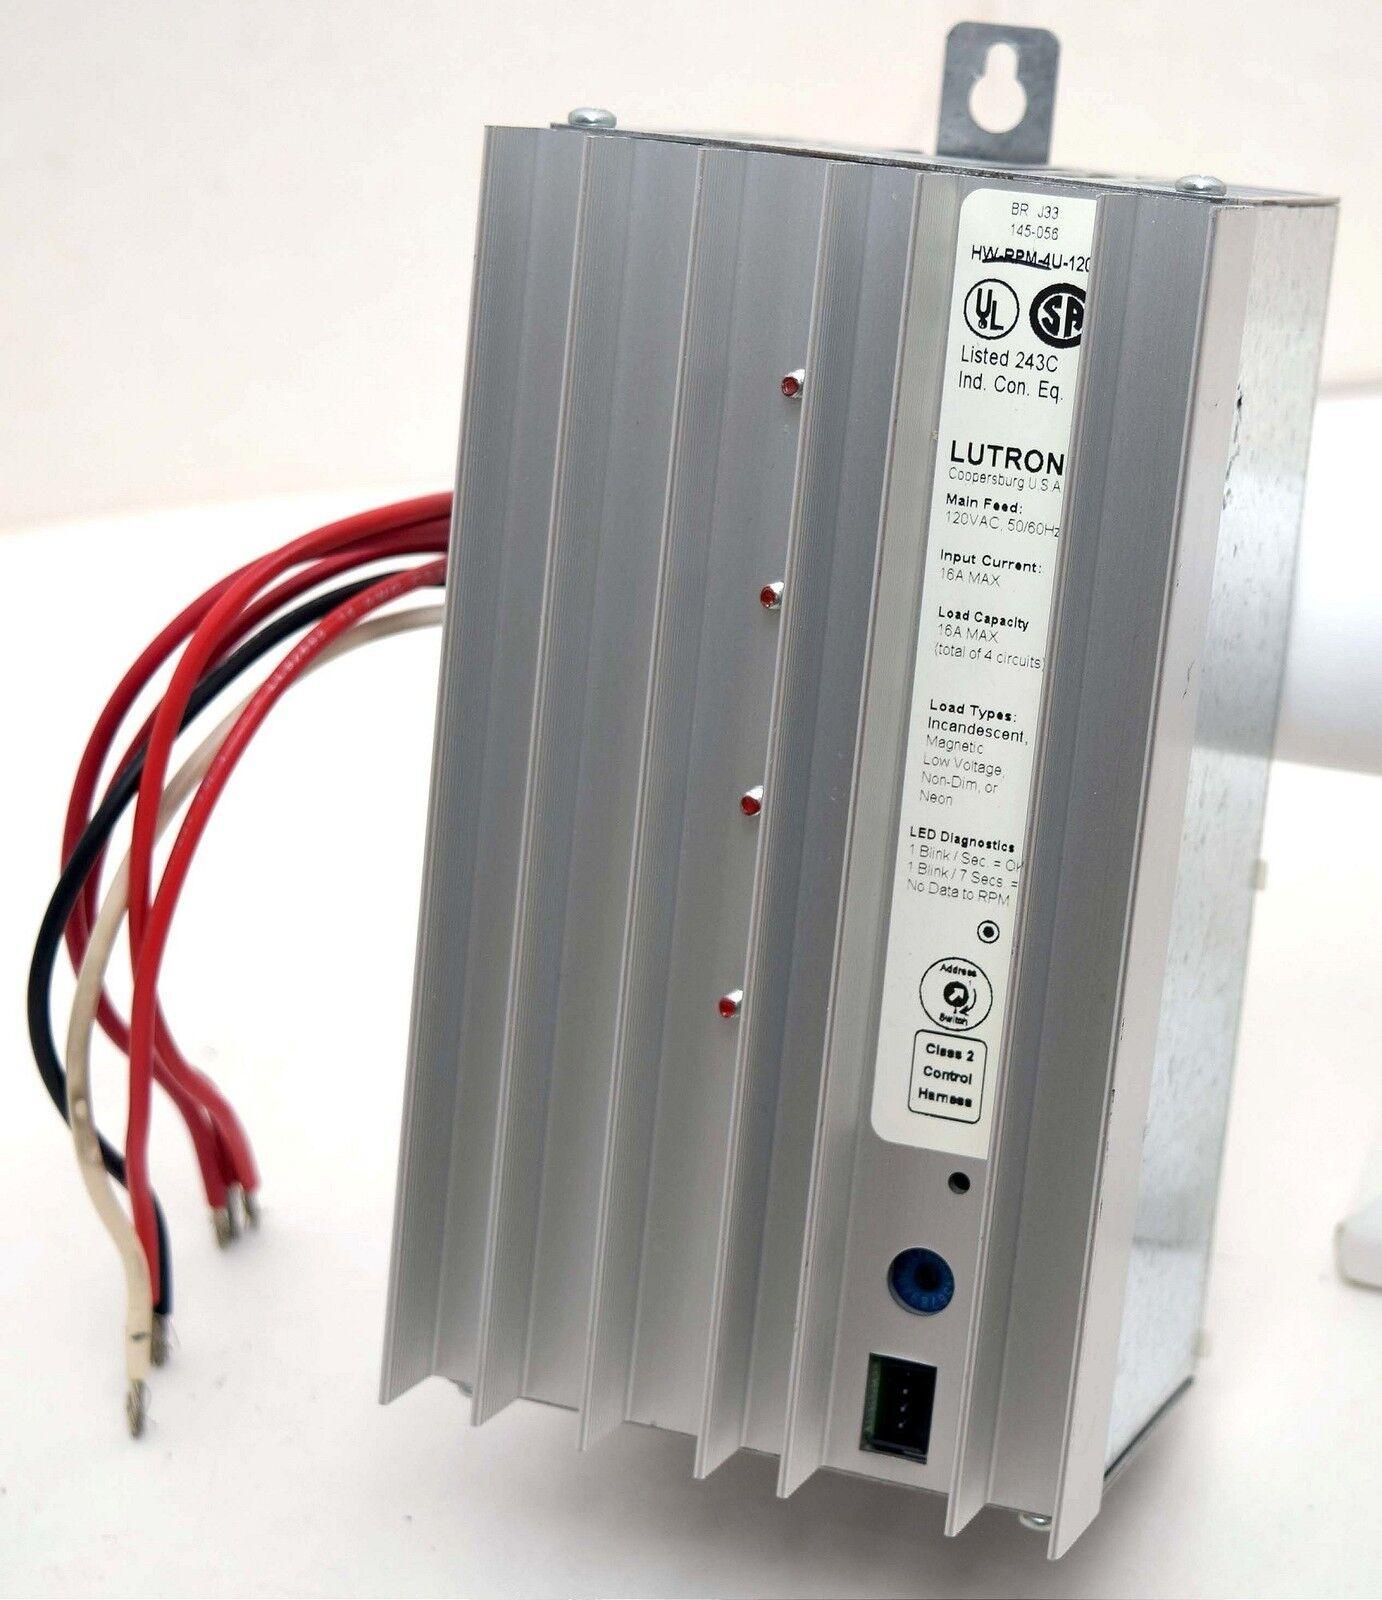 Lutron Hw Rpm 4u 120 Homeworks Dimming Remote Power Module